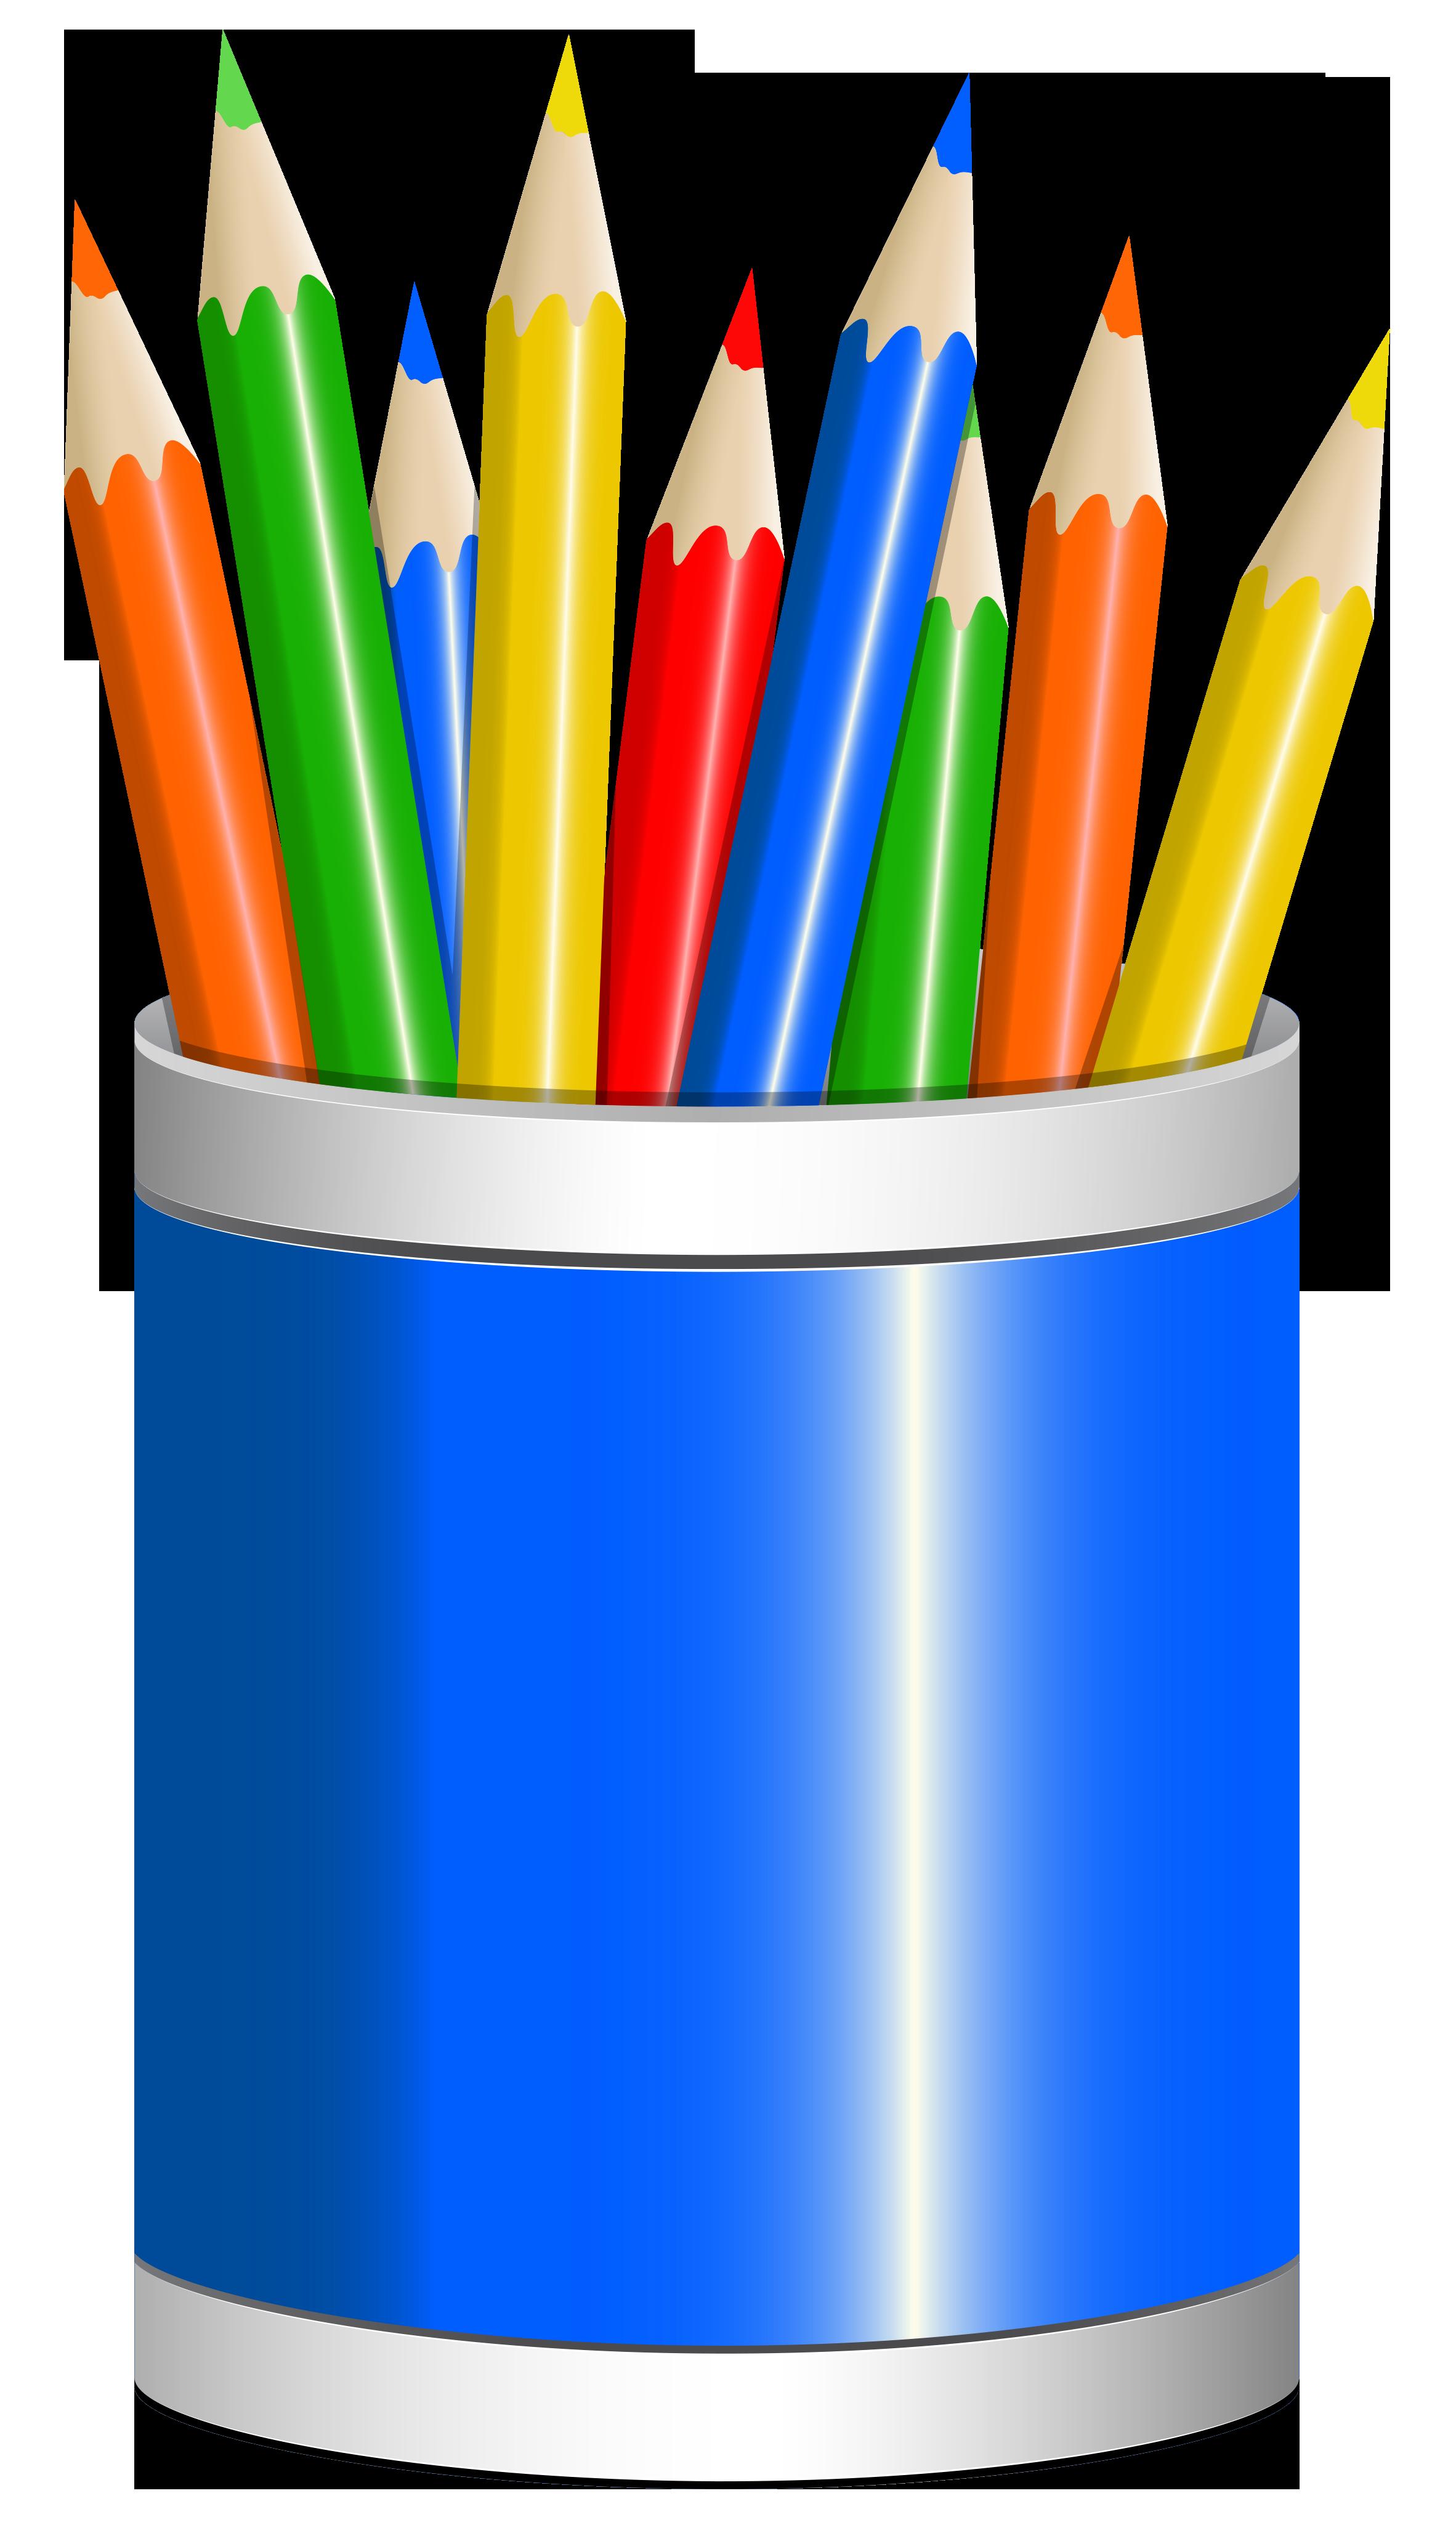 Blue cup png image. Clipart pencil school